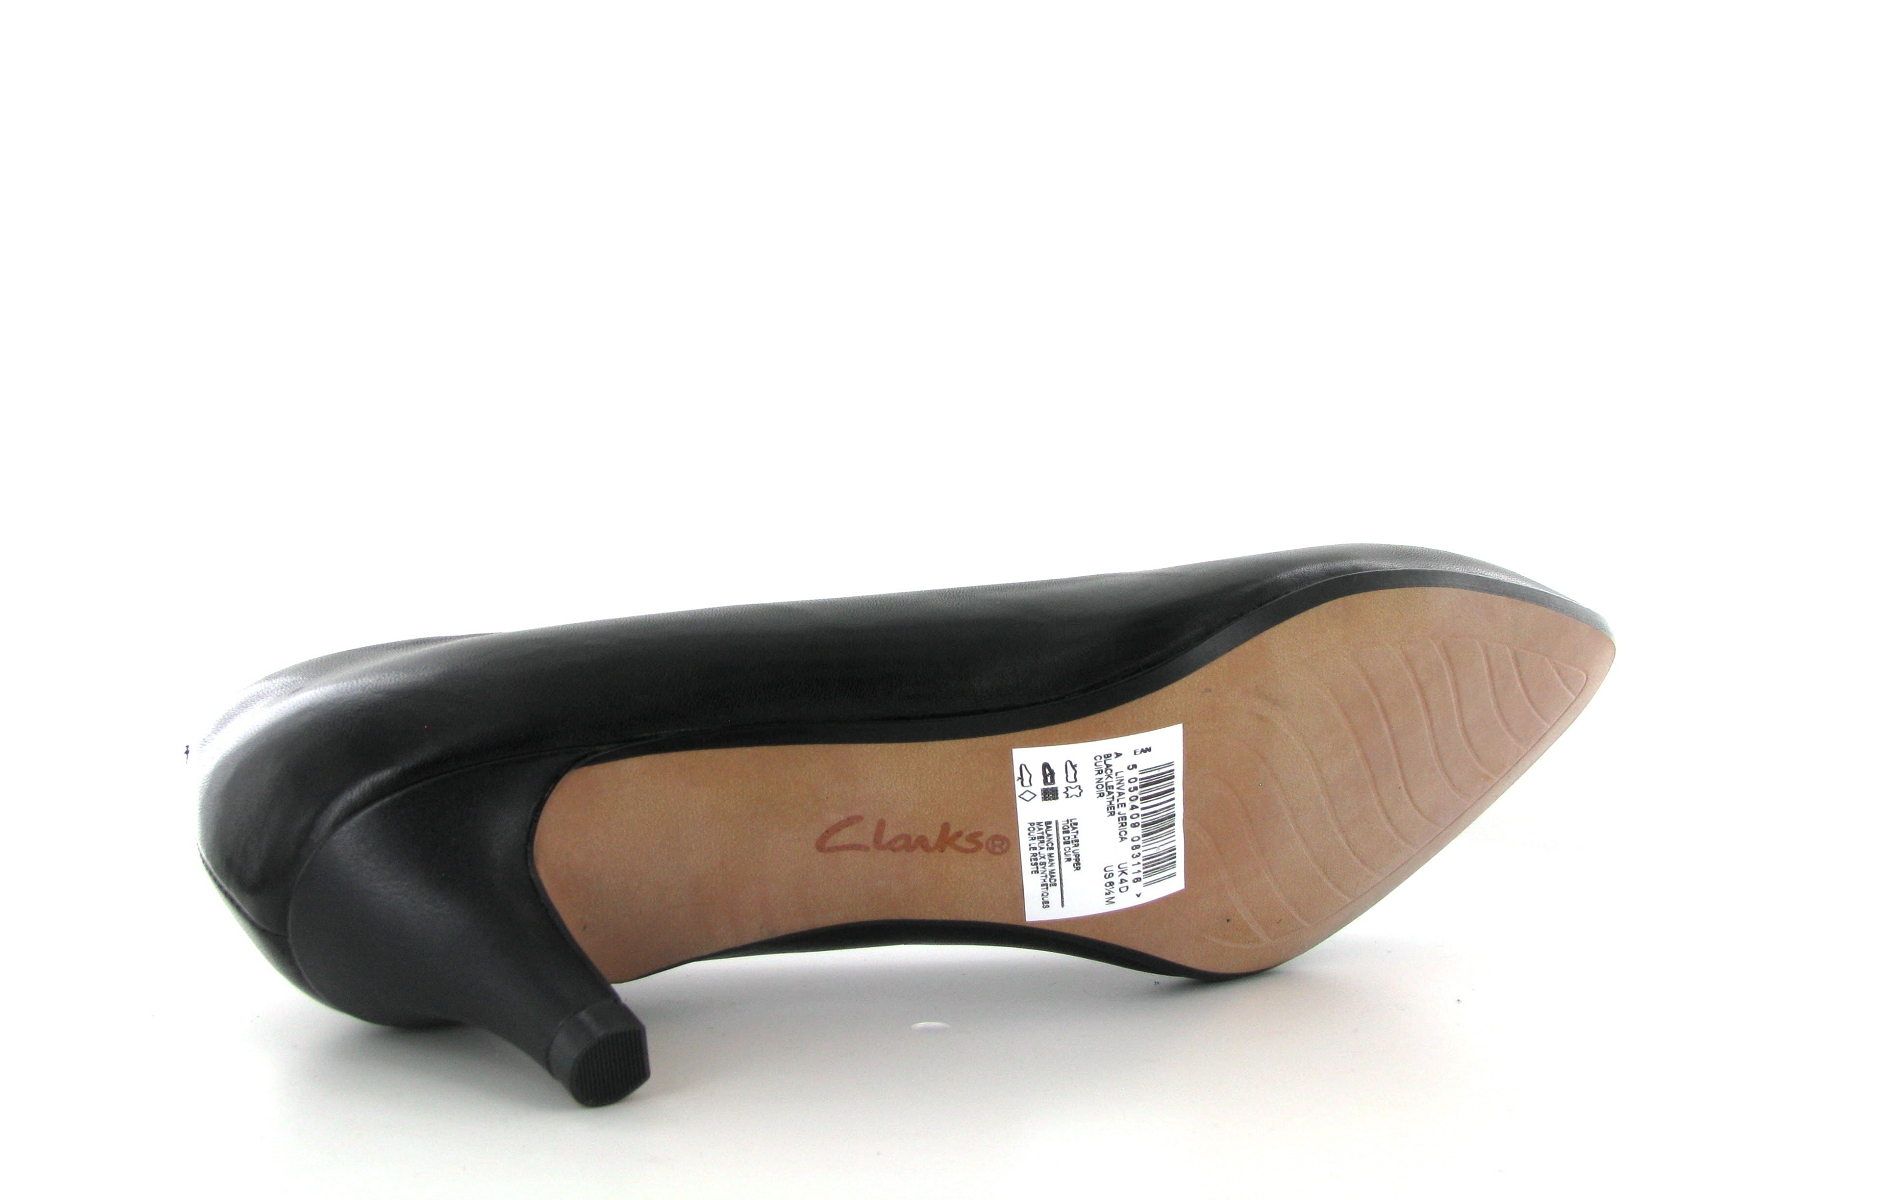 Clarks linvale jerica noir